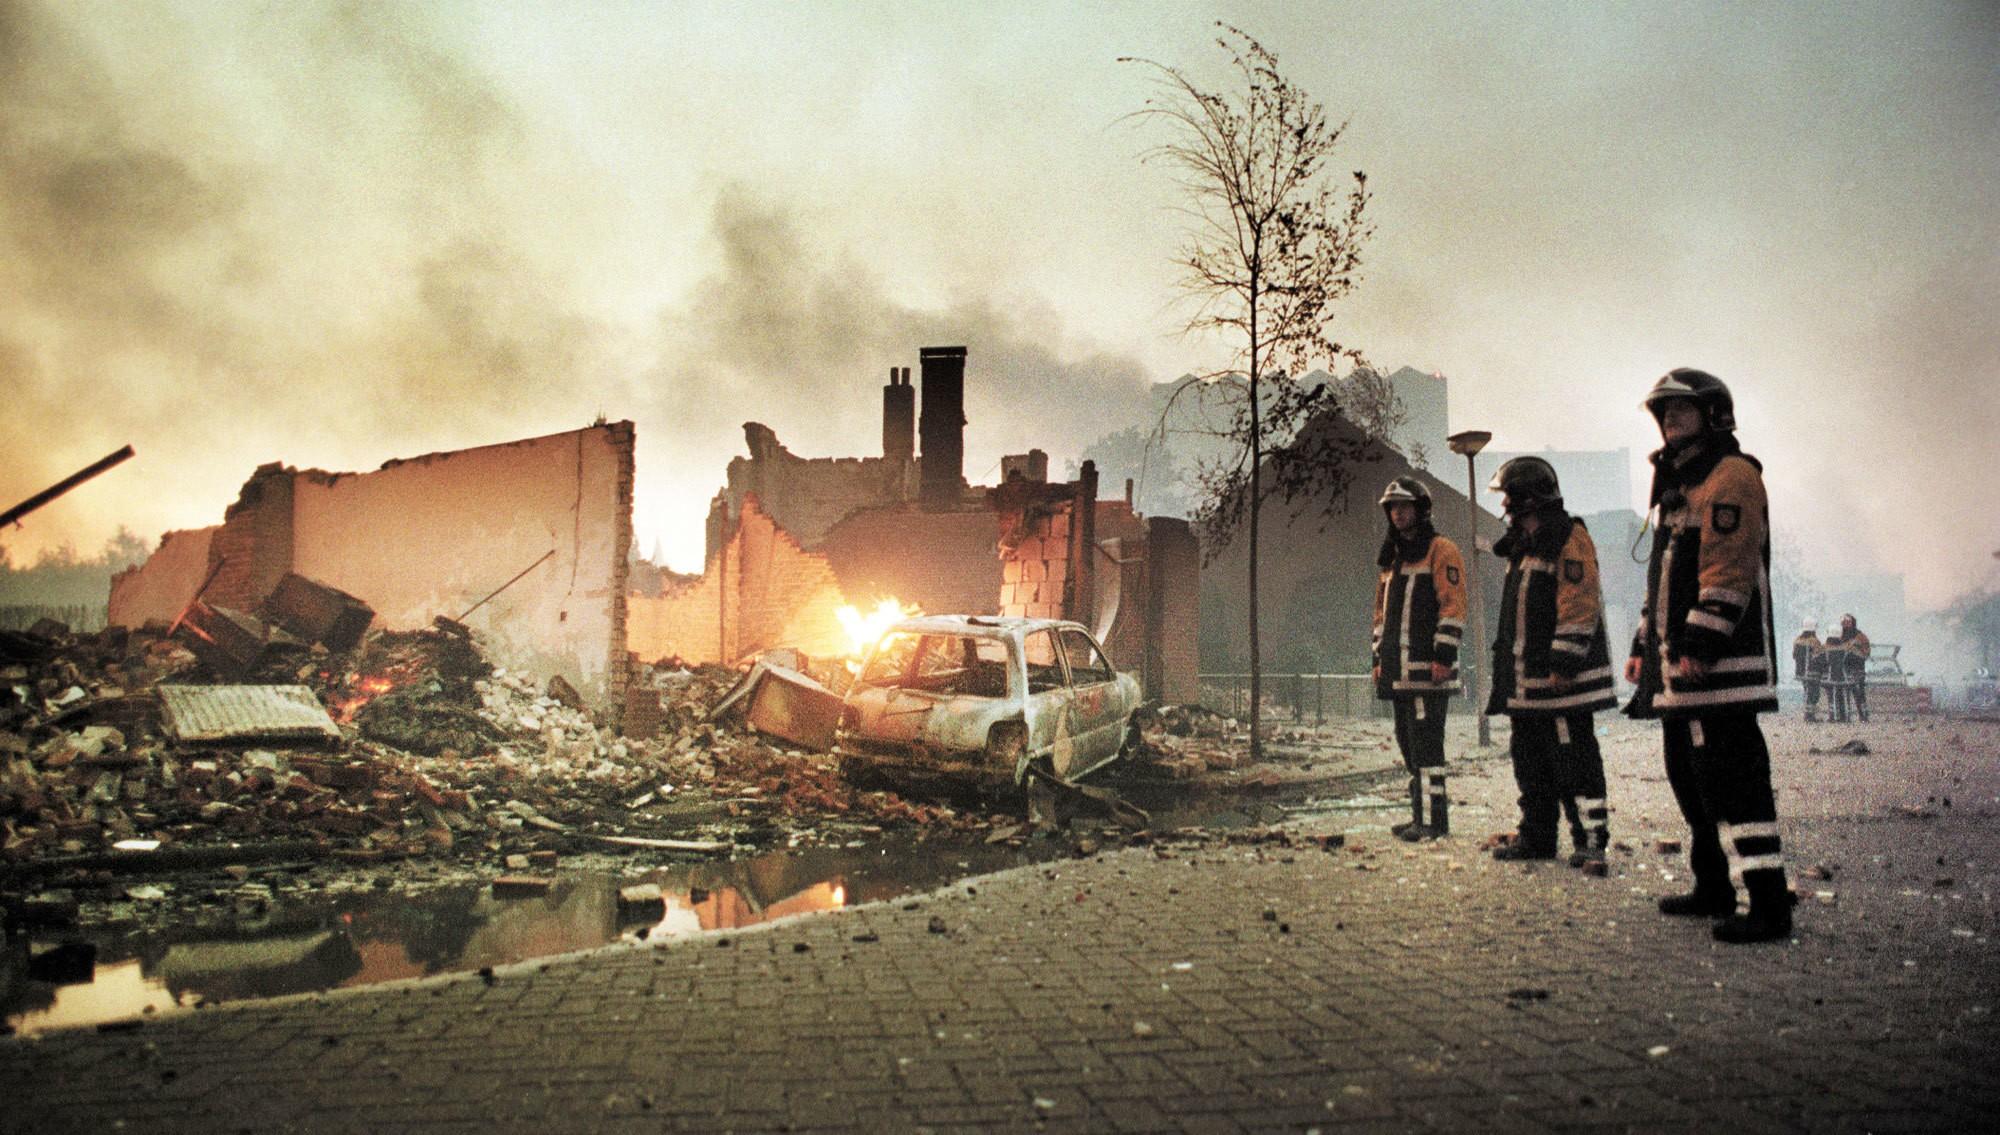 Enschede firemen